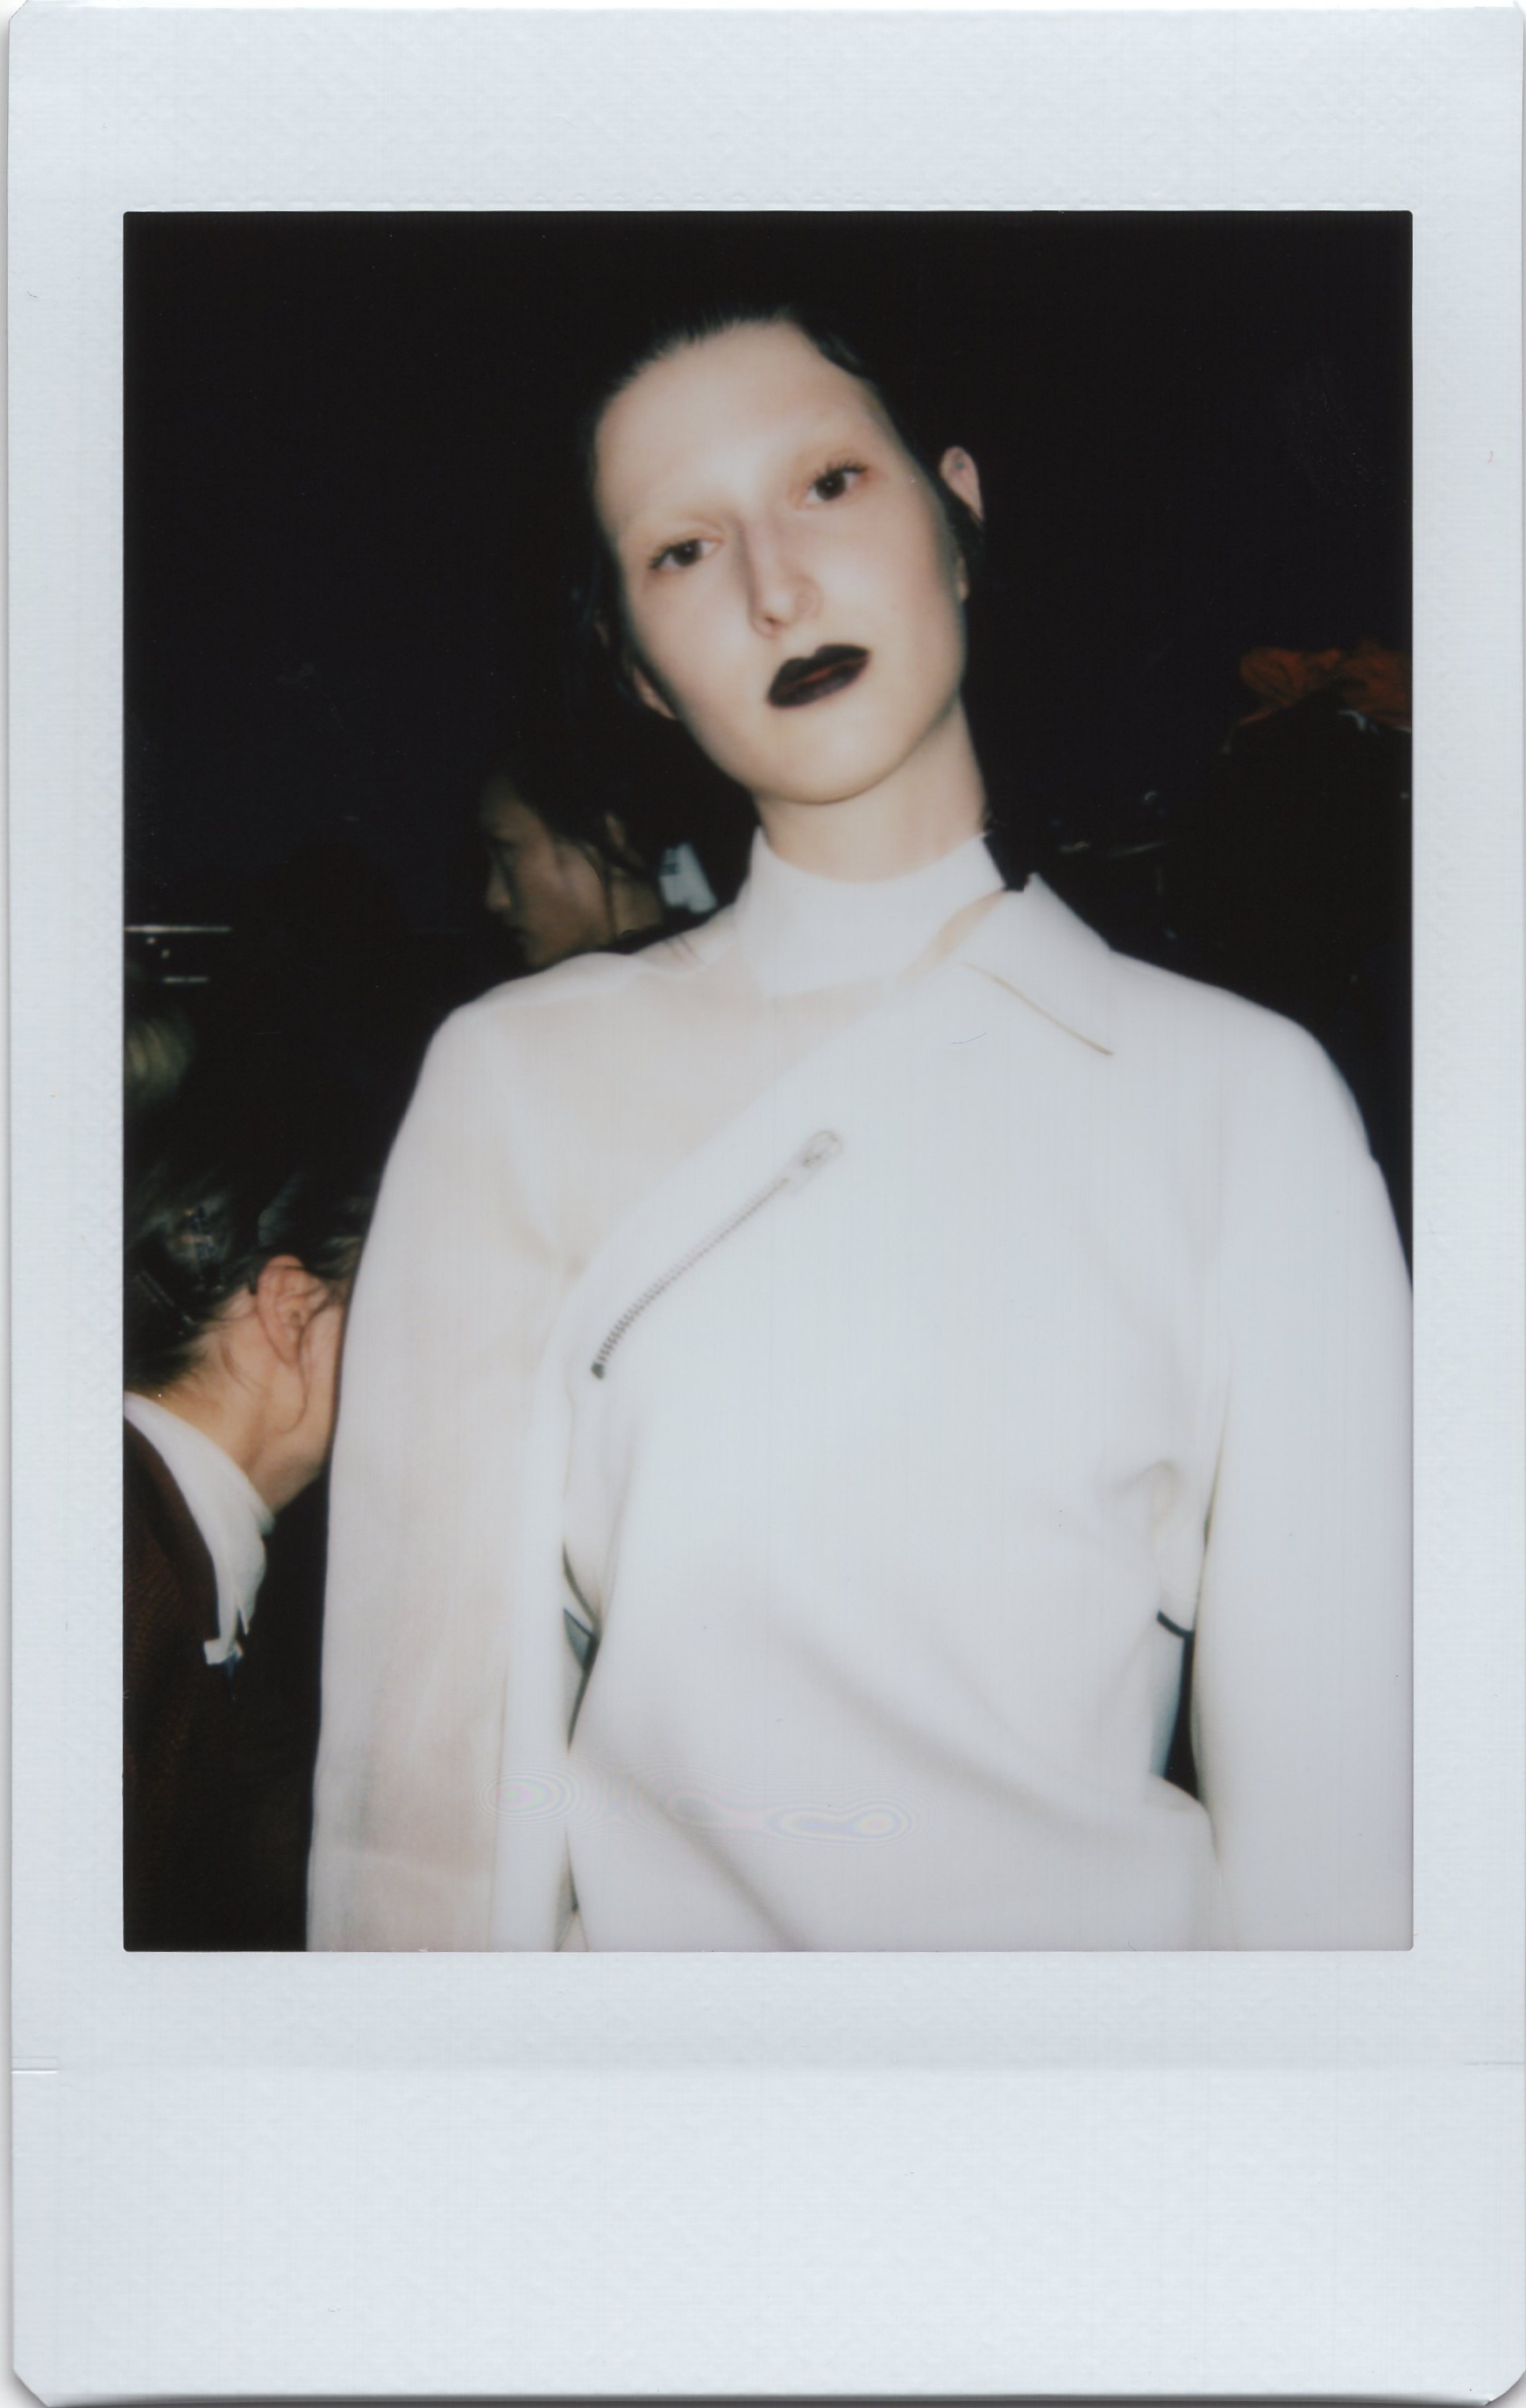 YangLi_Honigschreck_Backstage_Polaroid_7.jpg